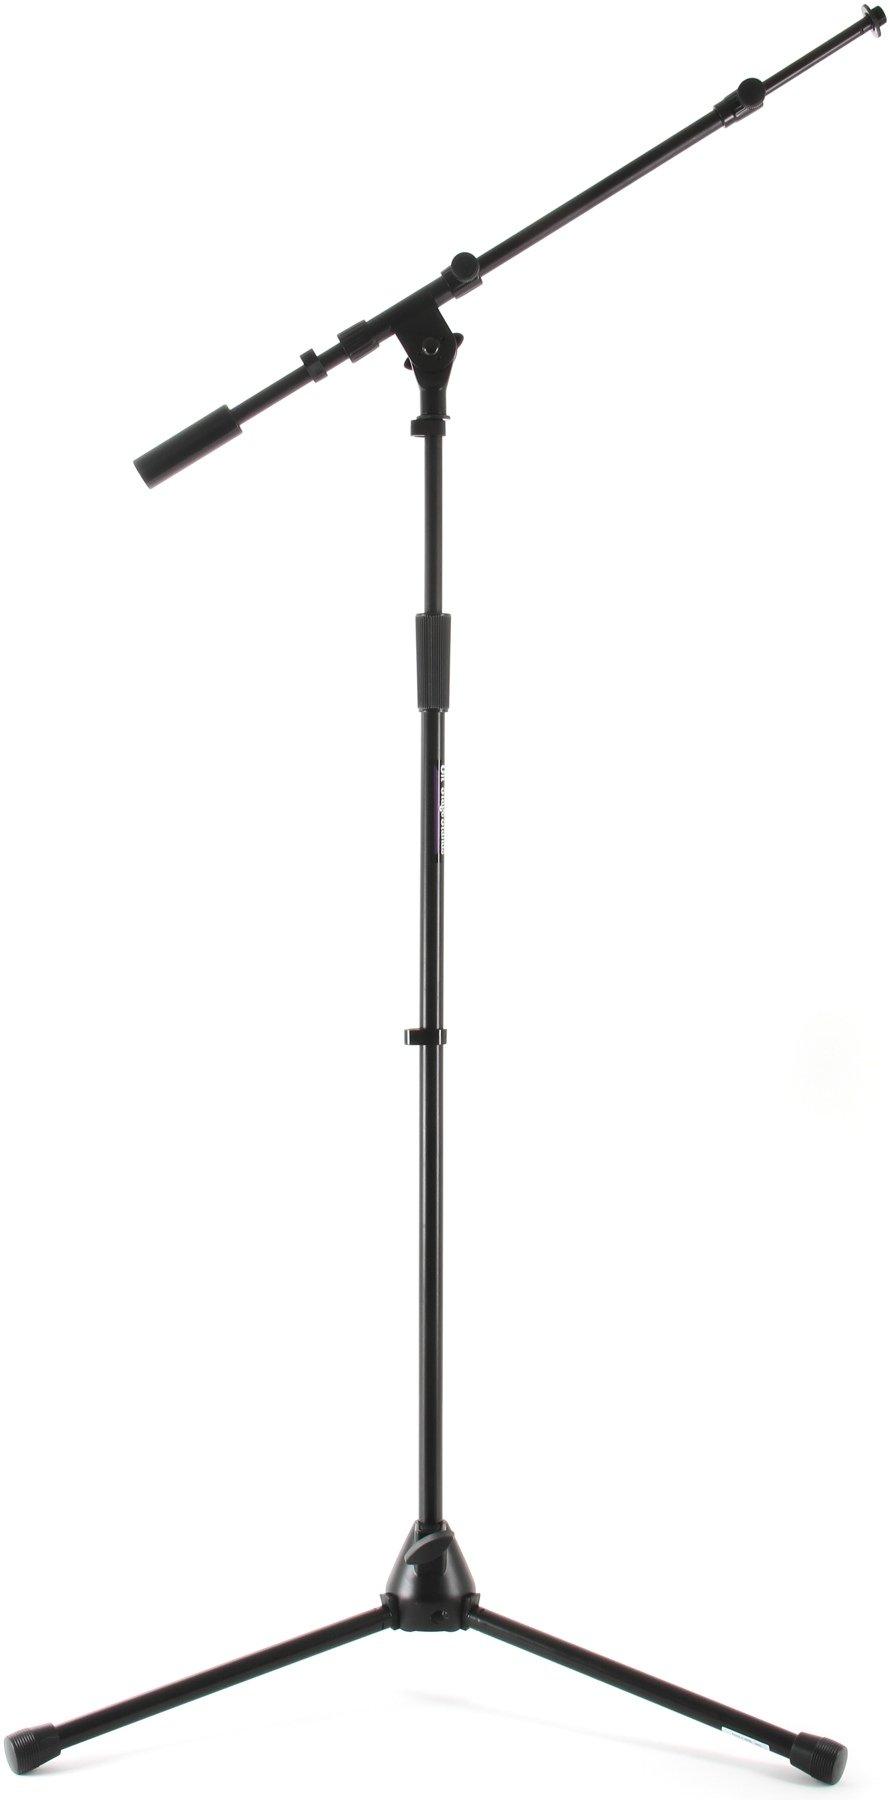 890x1800 Samson G Track Usb Condenser Microphone With Audio Interface